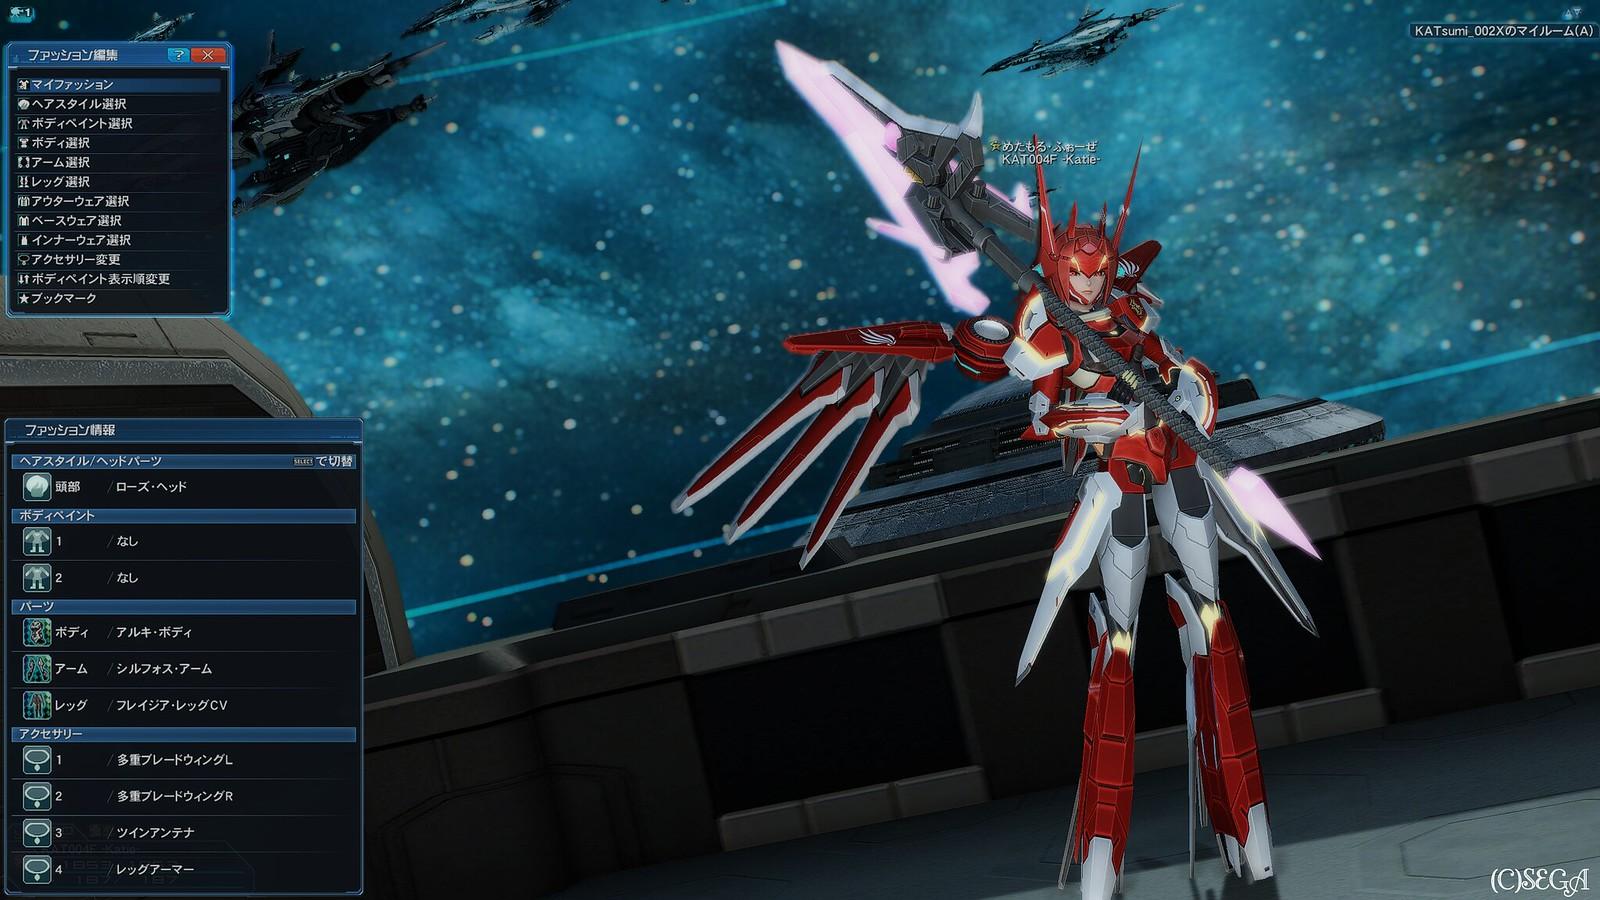 Phantasy Star Online 2 Screenshot 2020.01.26 - 22.21.28.12